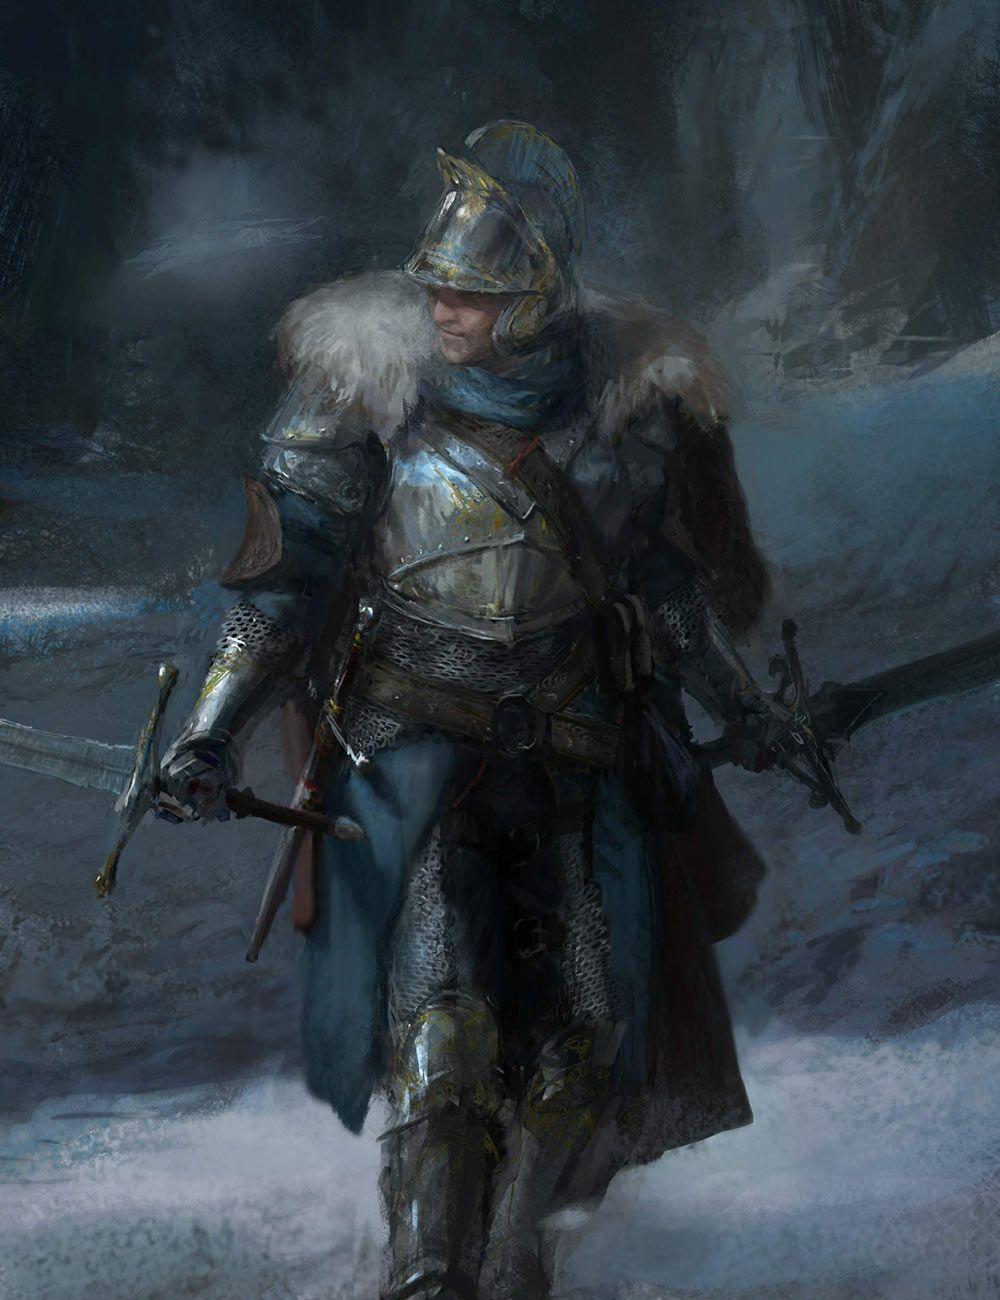 Dark Souls Character Design Process : Fur adorned armor from dark souls ii d character design